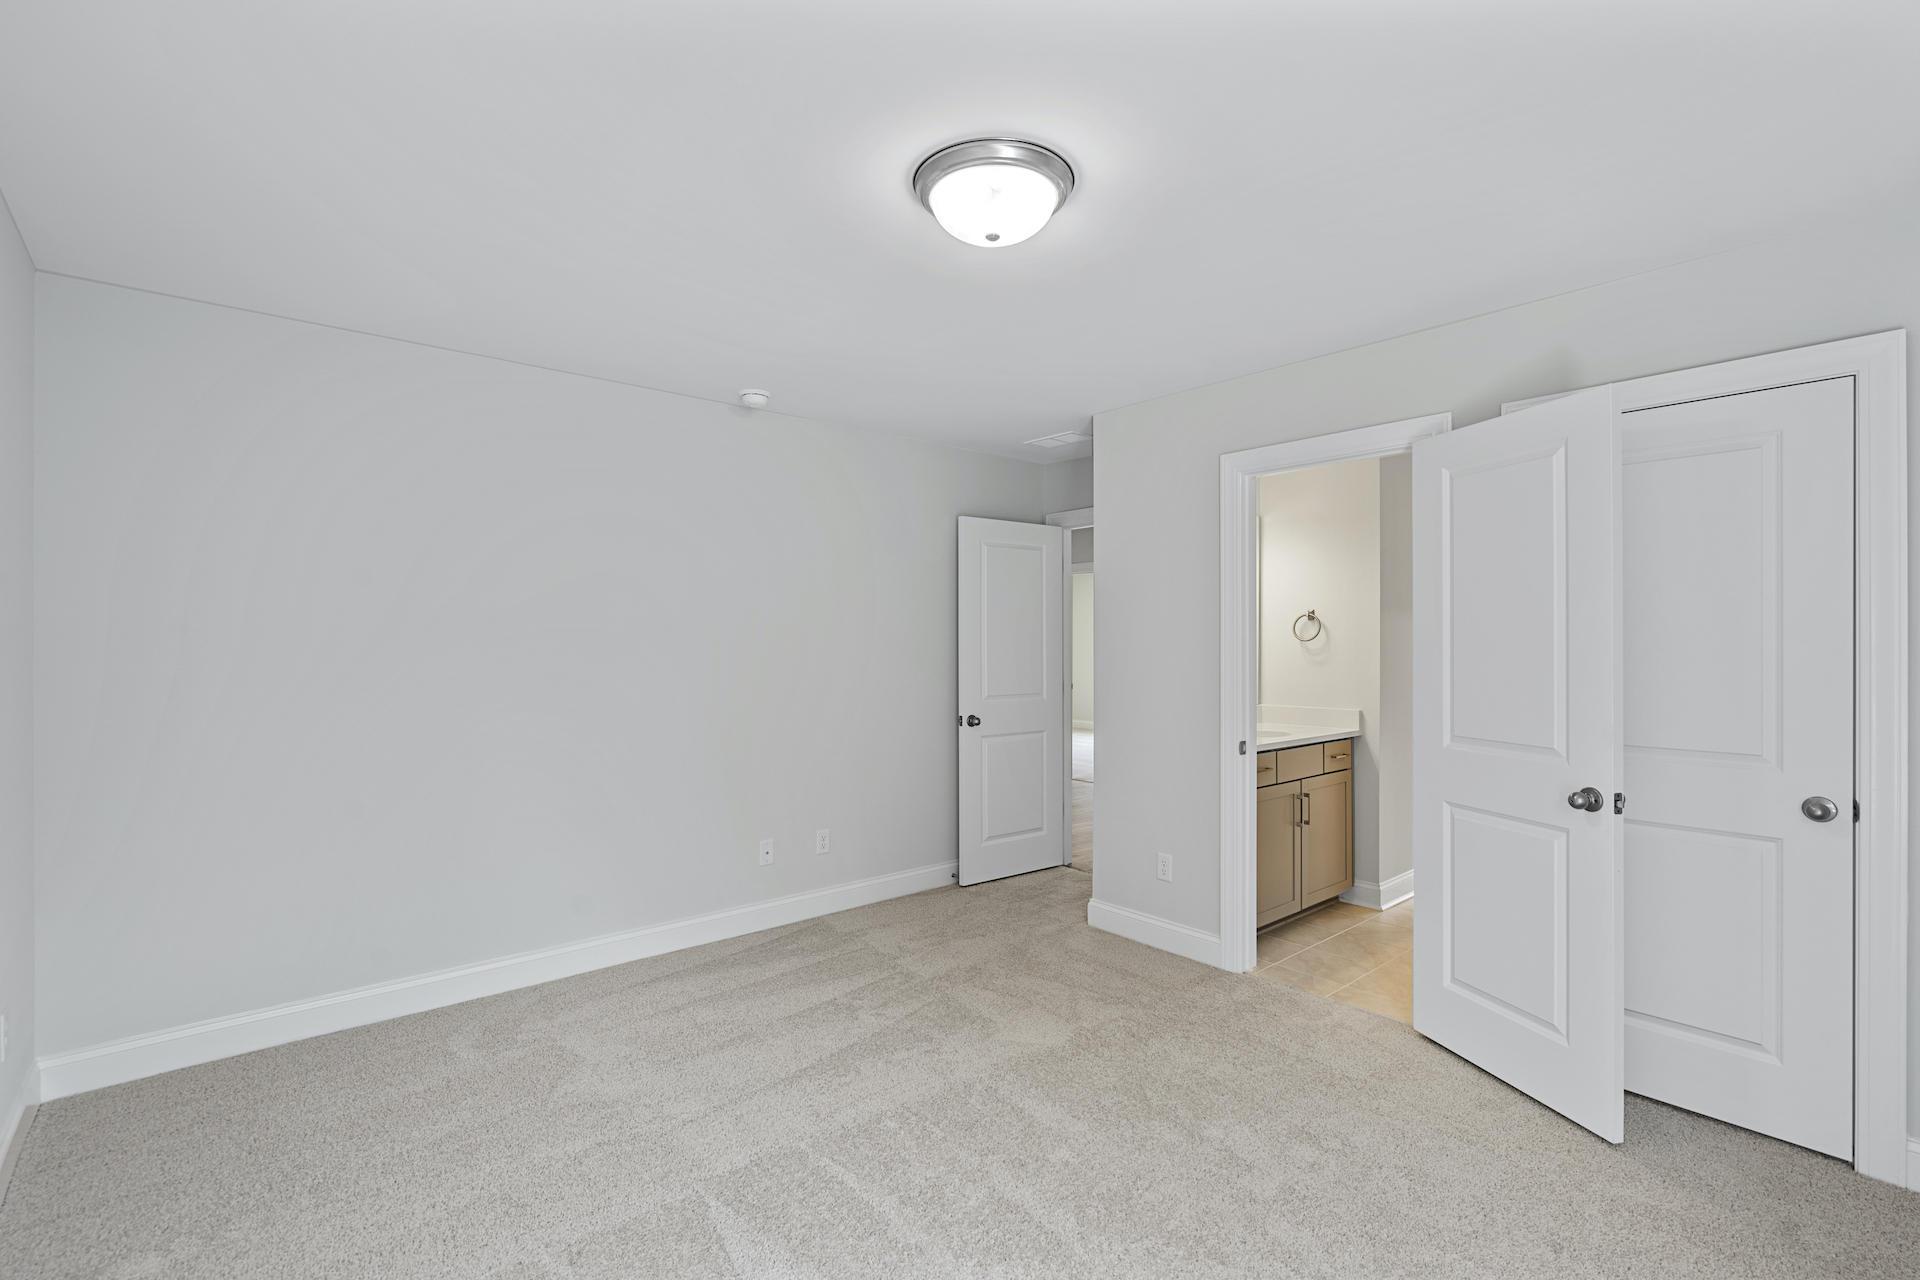 Drayton Oaks Homes For Sale - 105 Plowden Mill, Summerville, SC - 2